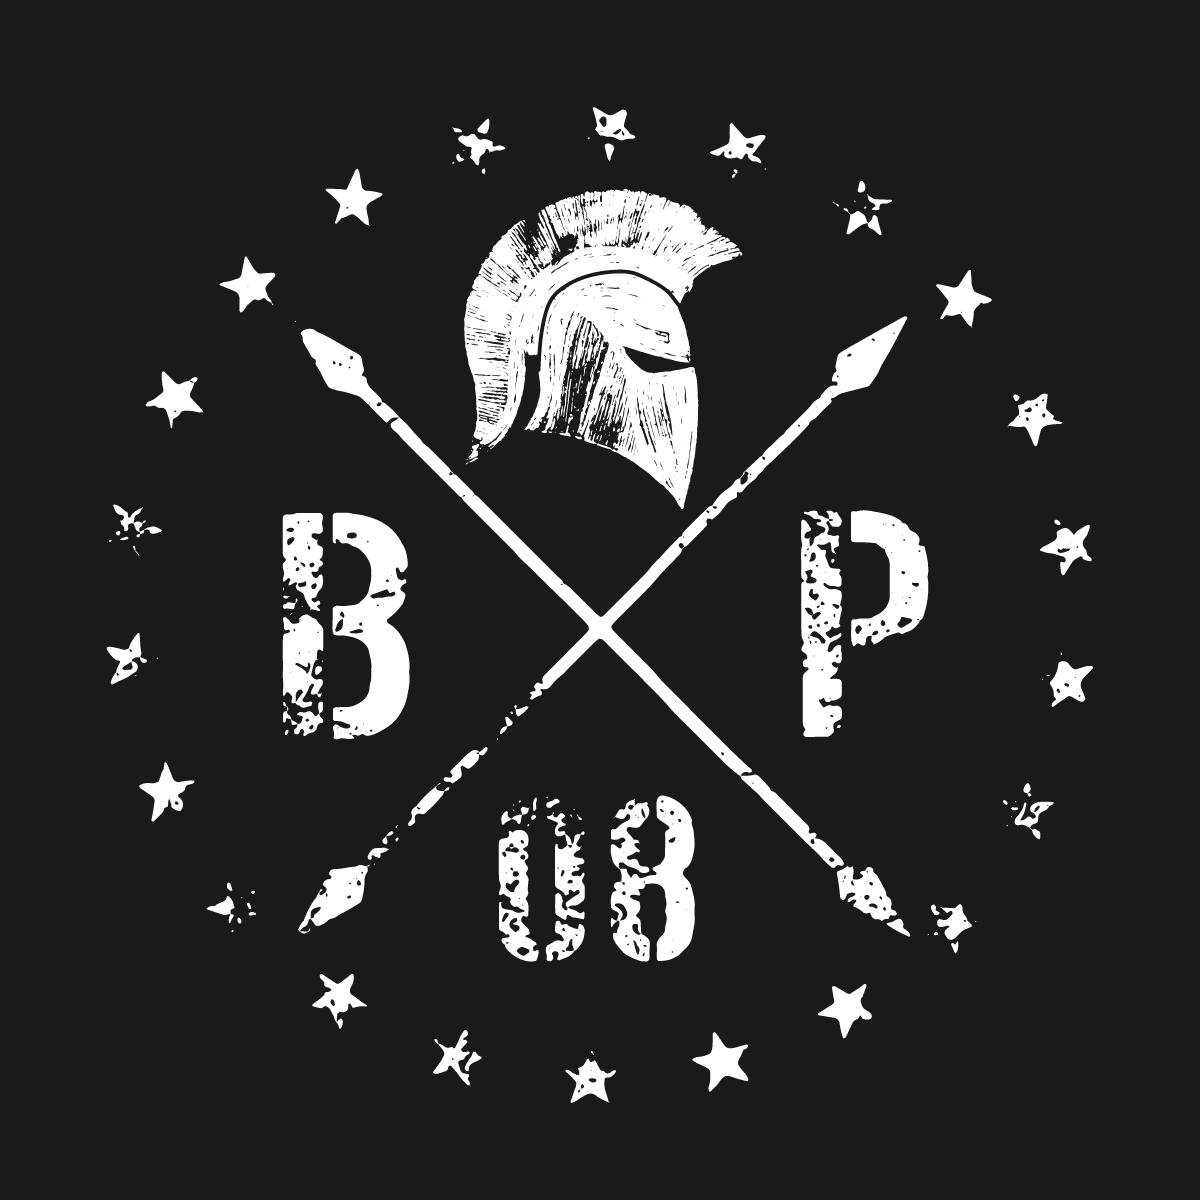 BPDC Seal Logo B&W 2.png